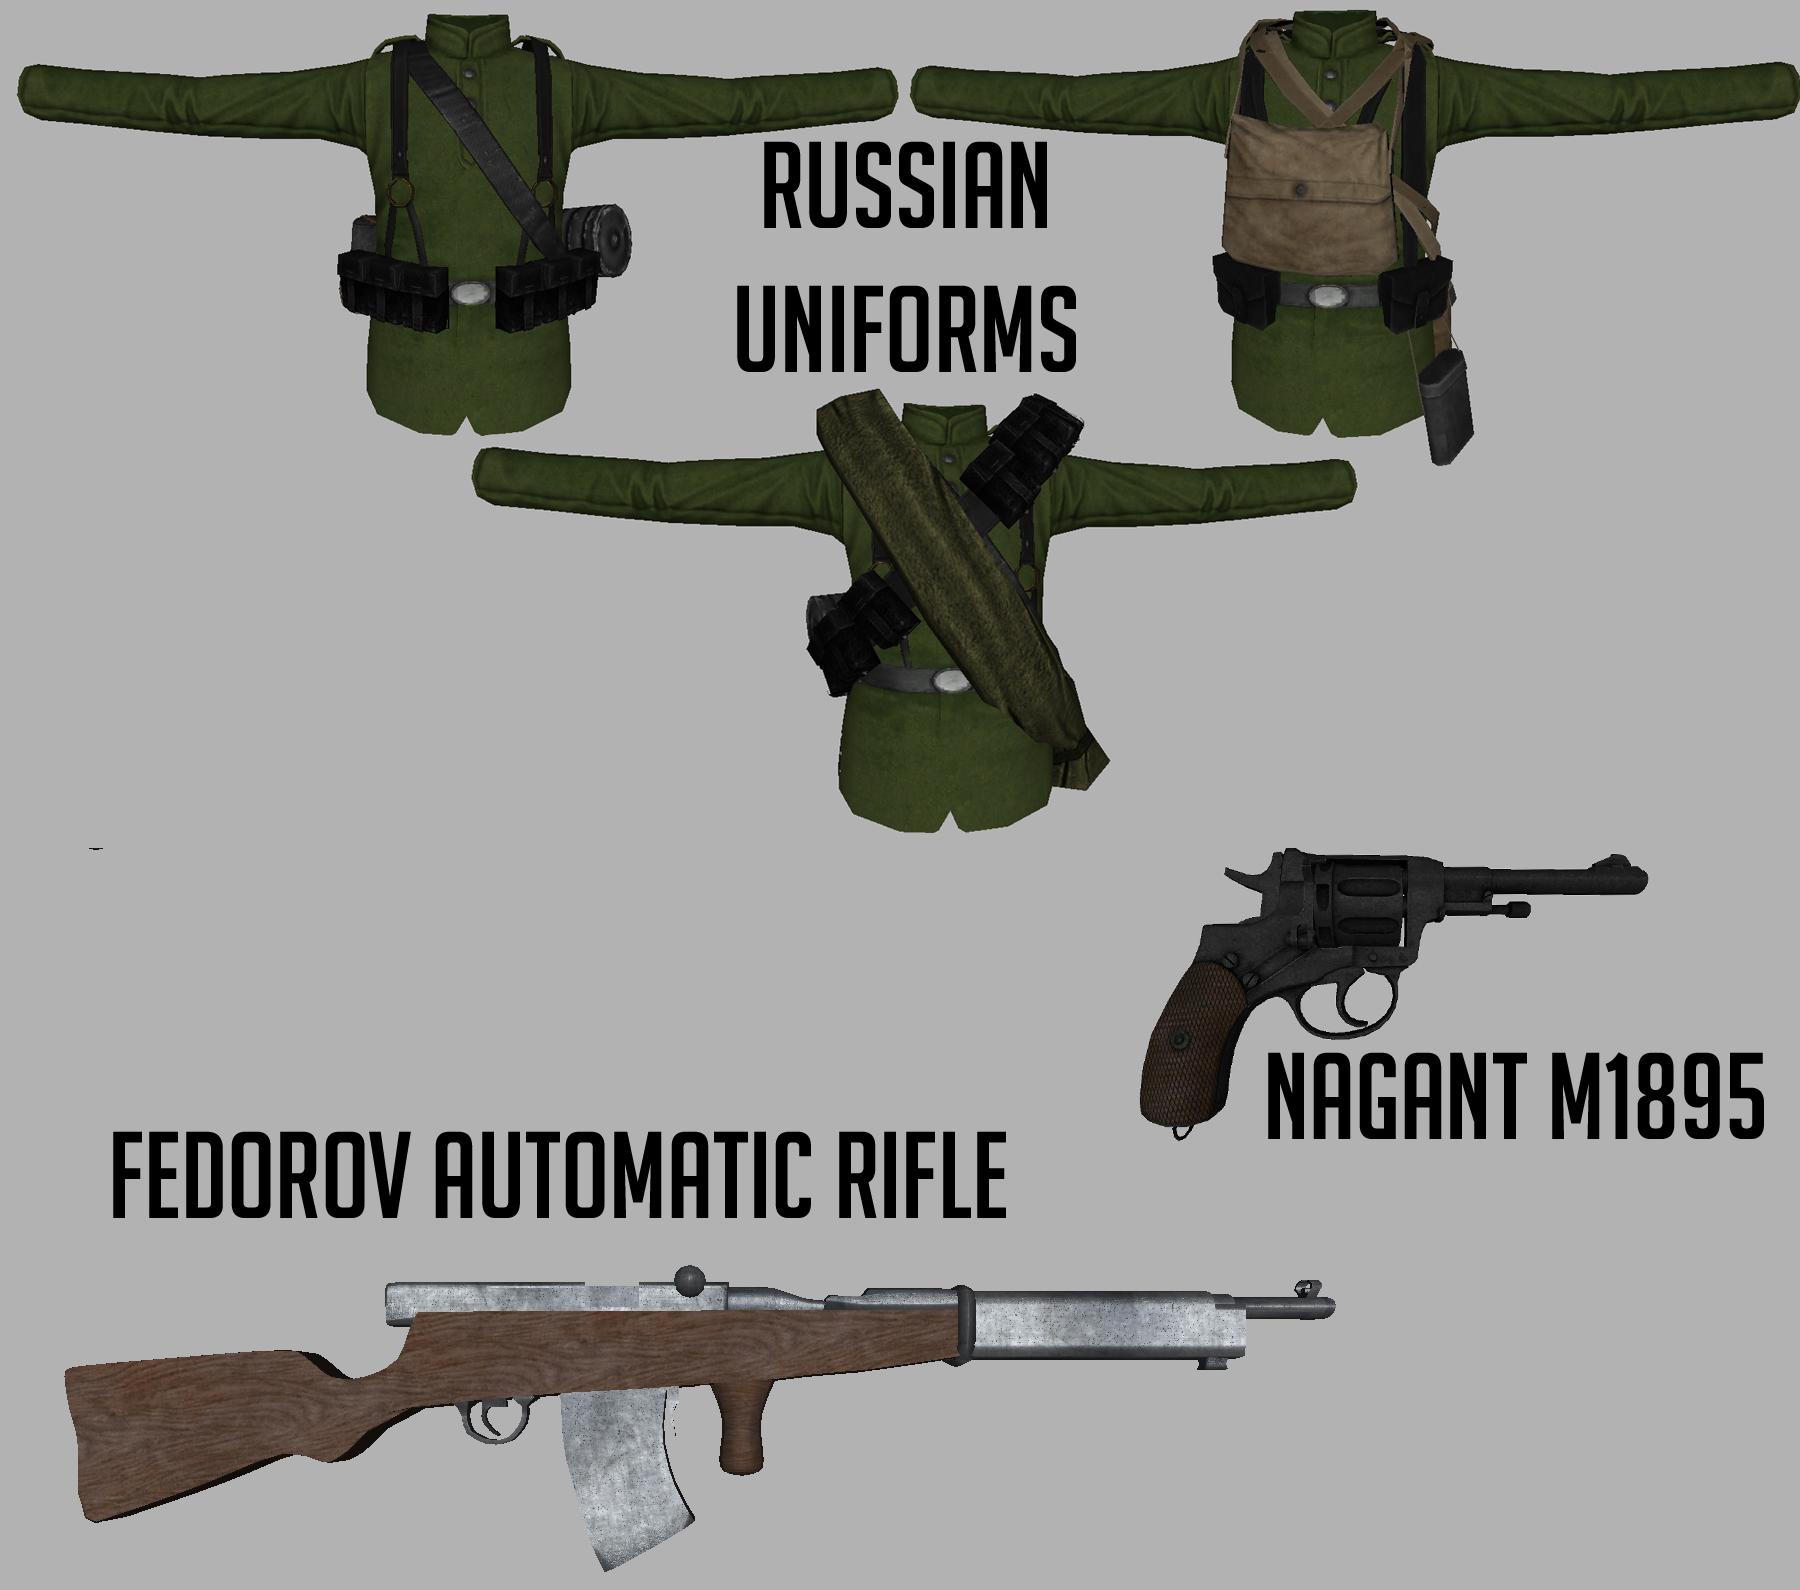 [SP][ES] Parabellum - Página 2 Russia_presentation2